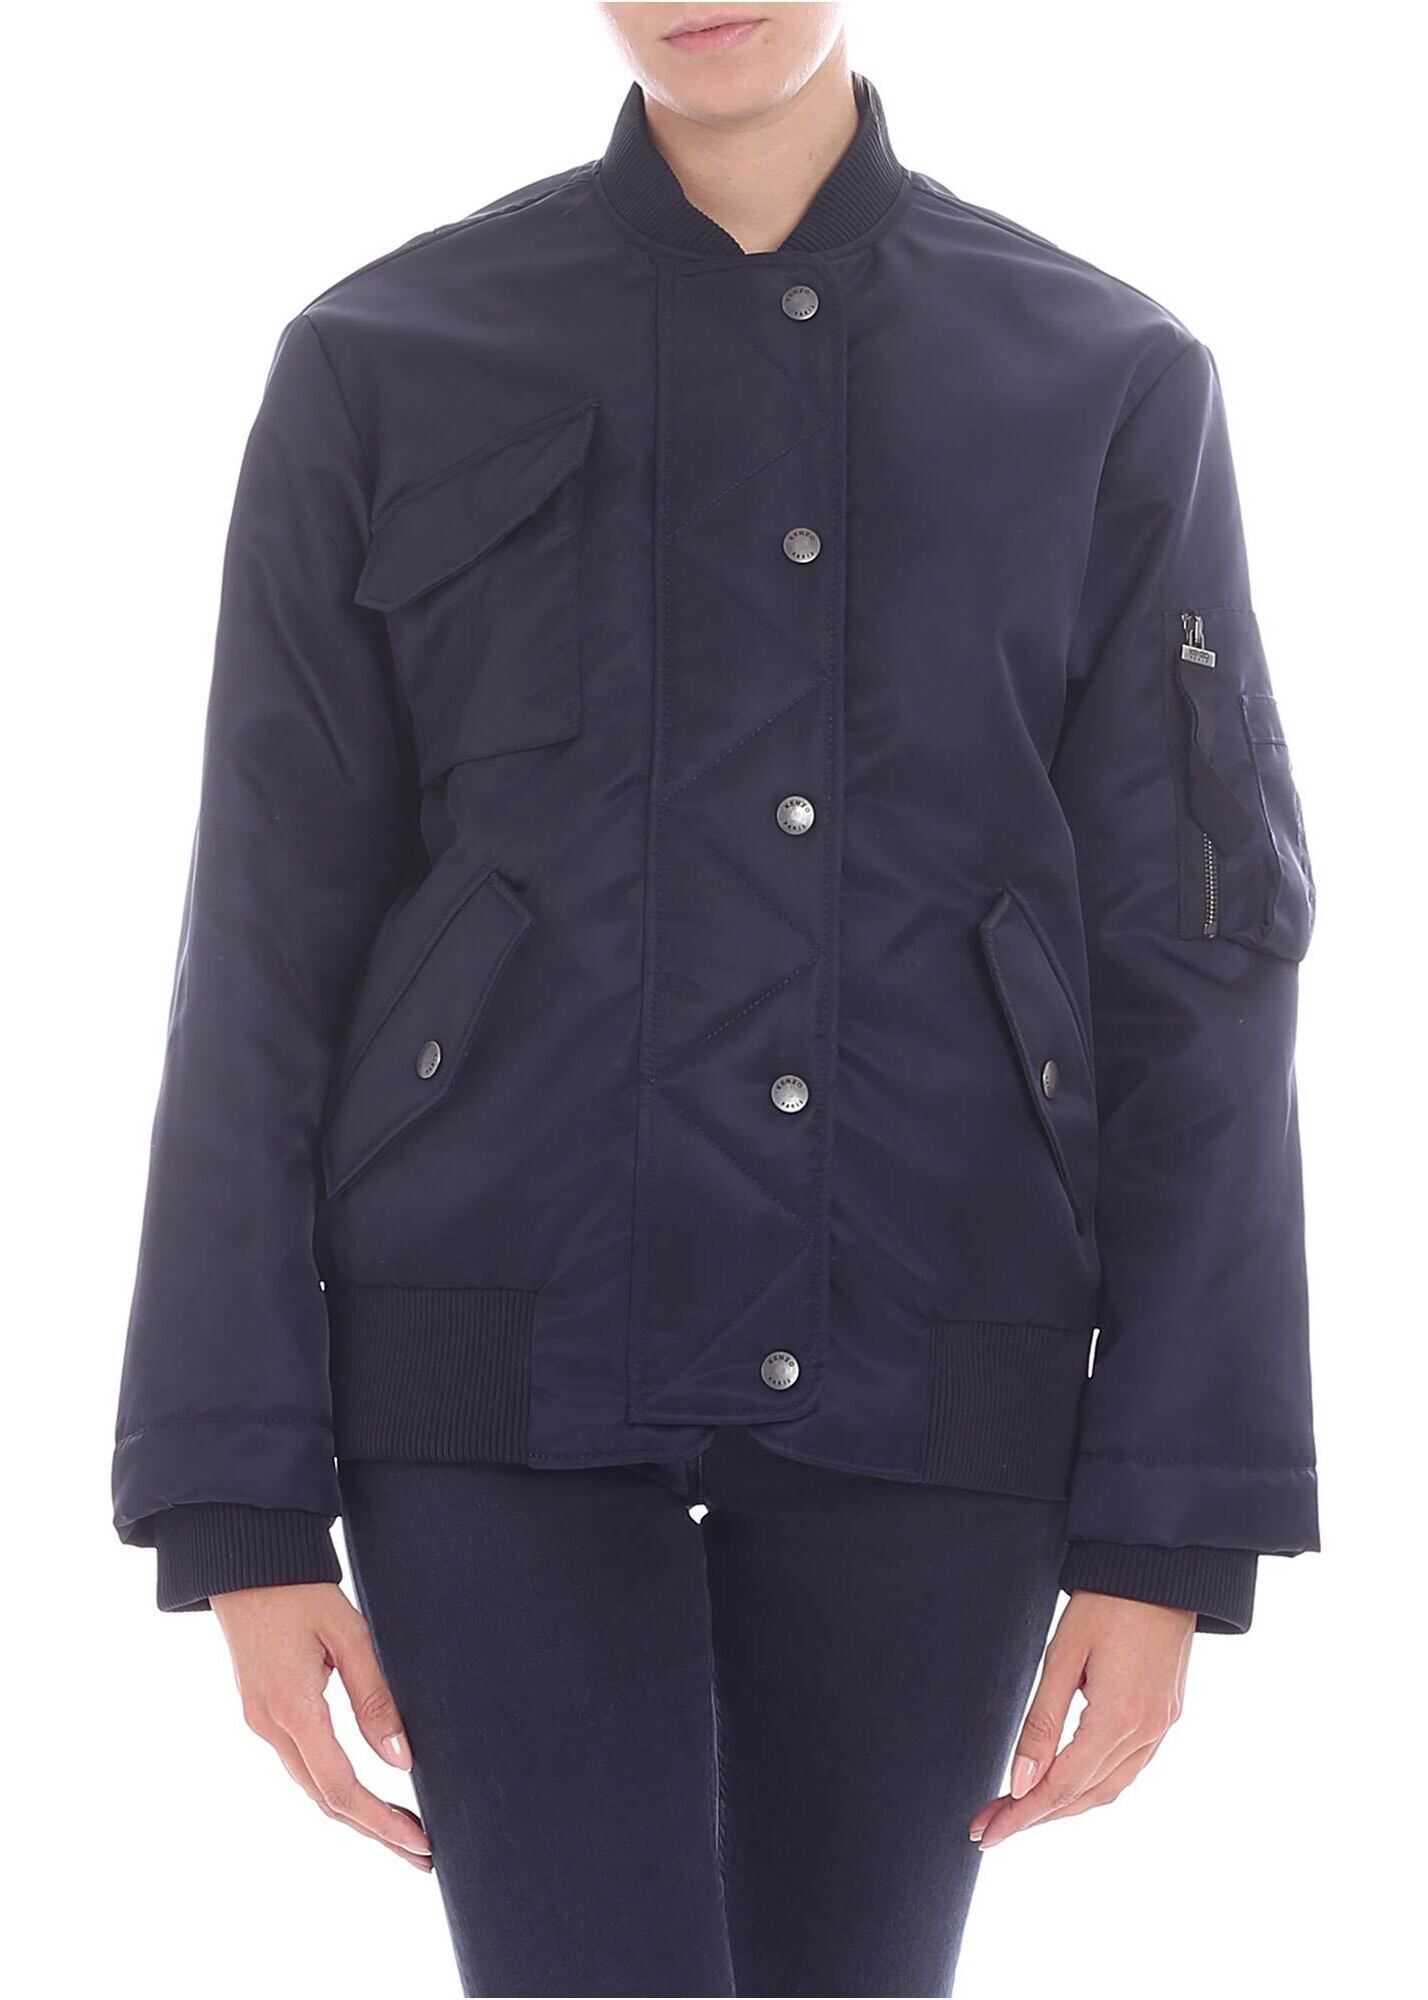 Blue Overfit Bomber Jacket